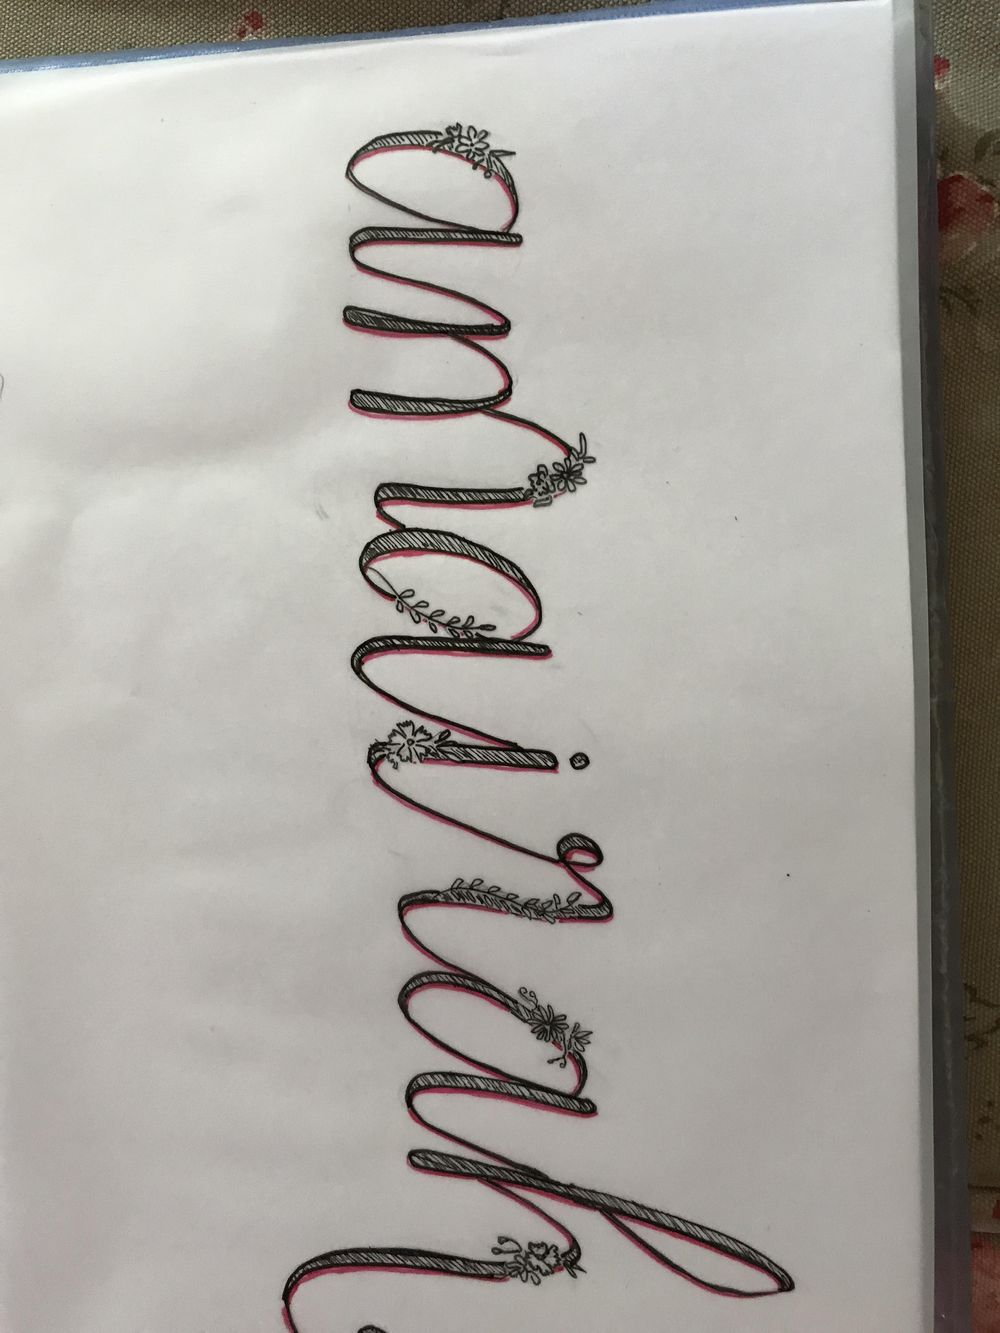 Flower alphabet - image 1 - student project